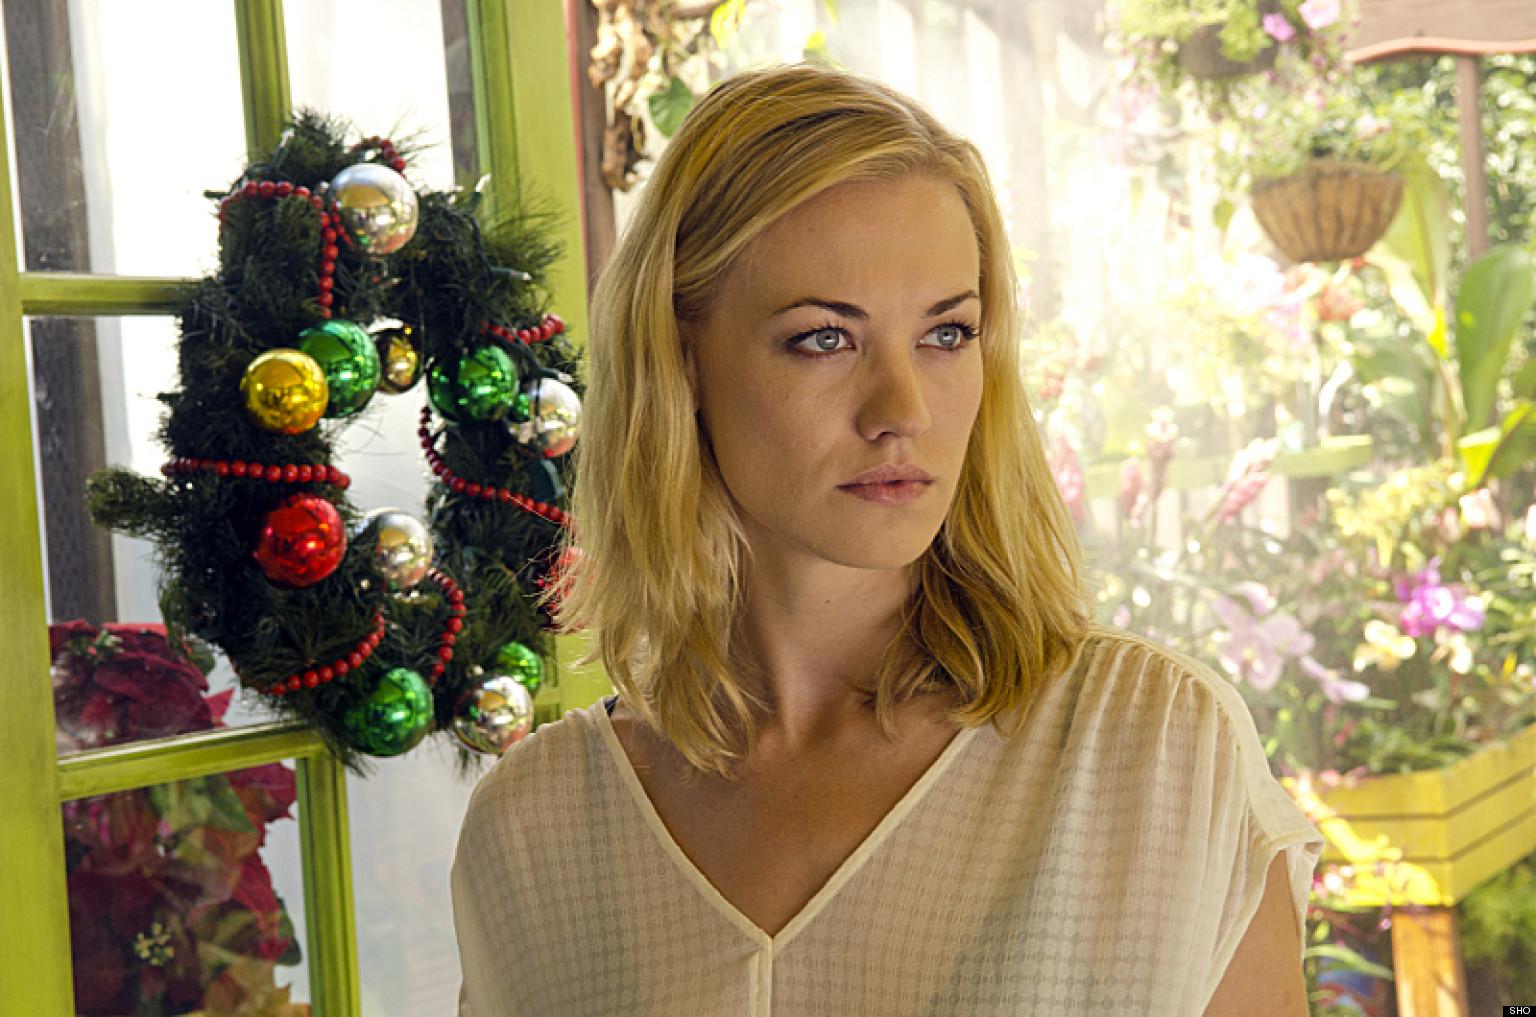 Heart Breaking Girl Wallpaper Dexter Recap Hannah Mckay Has A Bad Christmas In Do